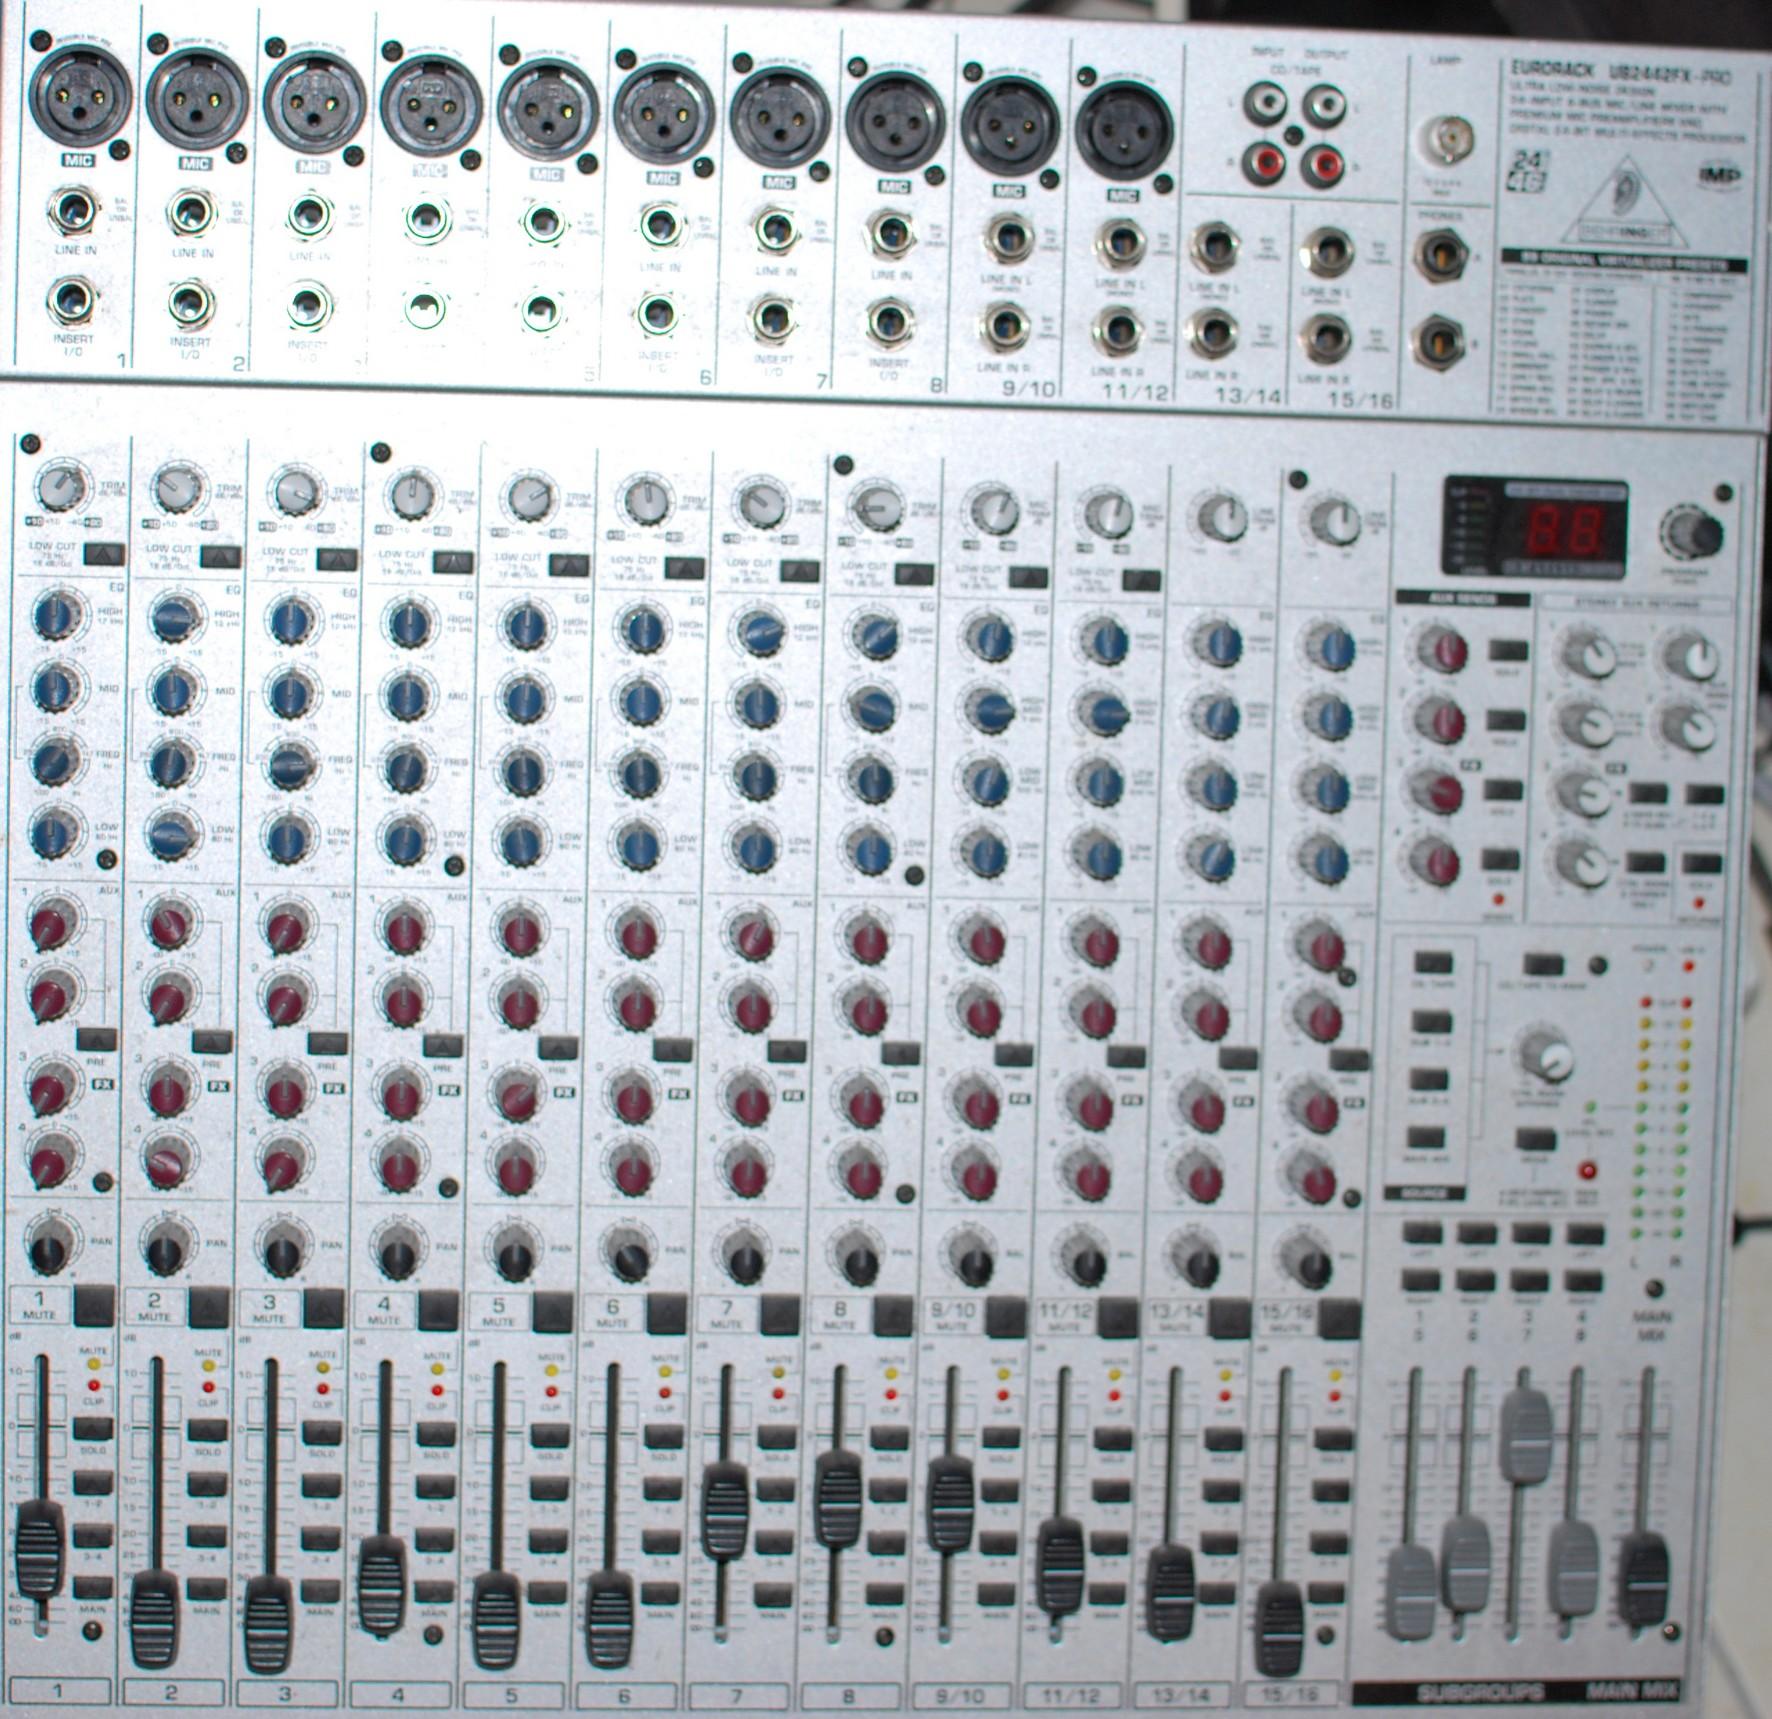 behringer eurorack ub2442fx pro image 300291 audiofanzine rh en audiofanzine com Mixing Board Behringer 2442 FxPro Behringer UB2442FX Pro Mixer